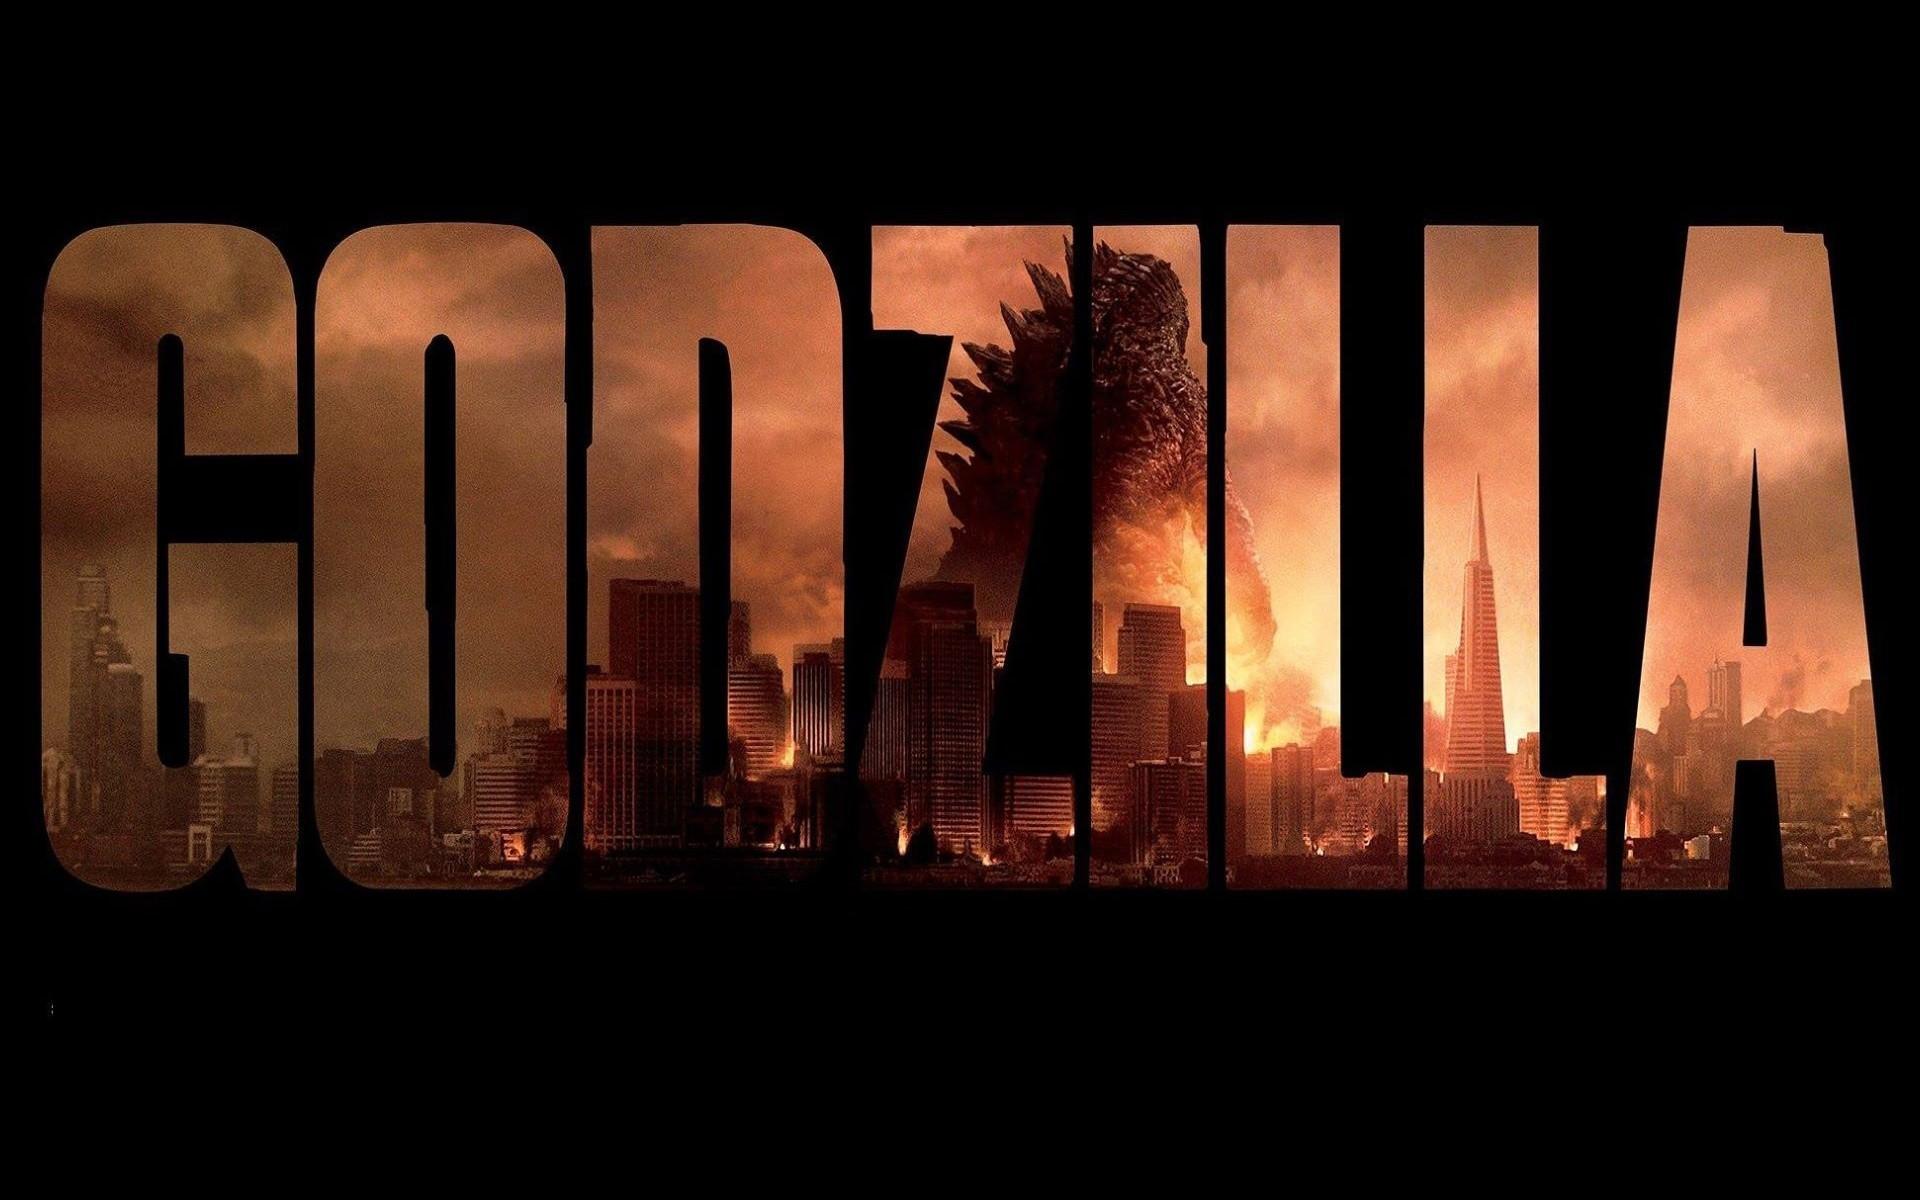 Godzilla Wallpapers Album on Imgur | HD Wallpapers | Pinterest | Godzilla, Hd  wallpaper and Wallpaper